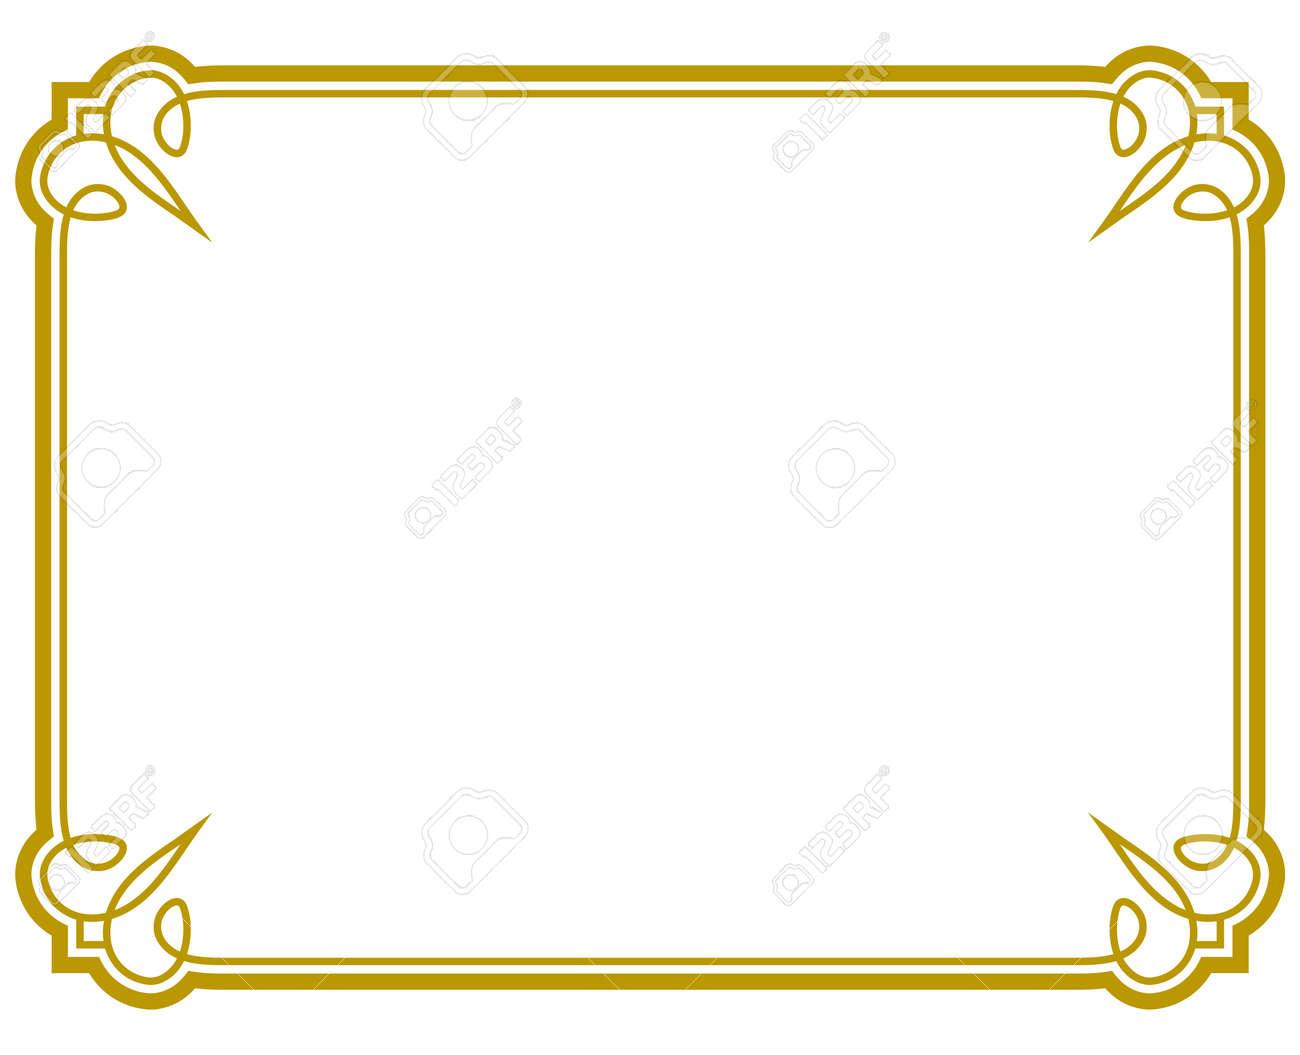 Yellow gold border frame deco vector art simple line corner - 52604156